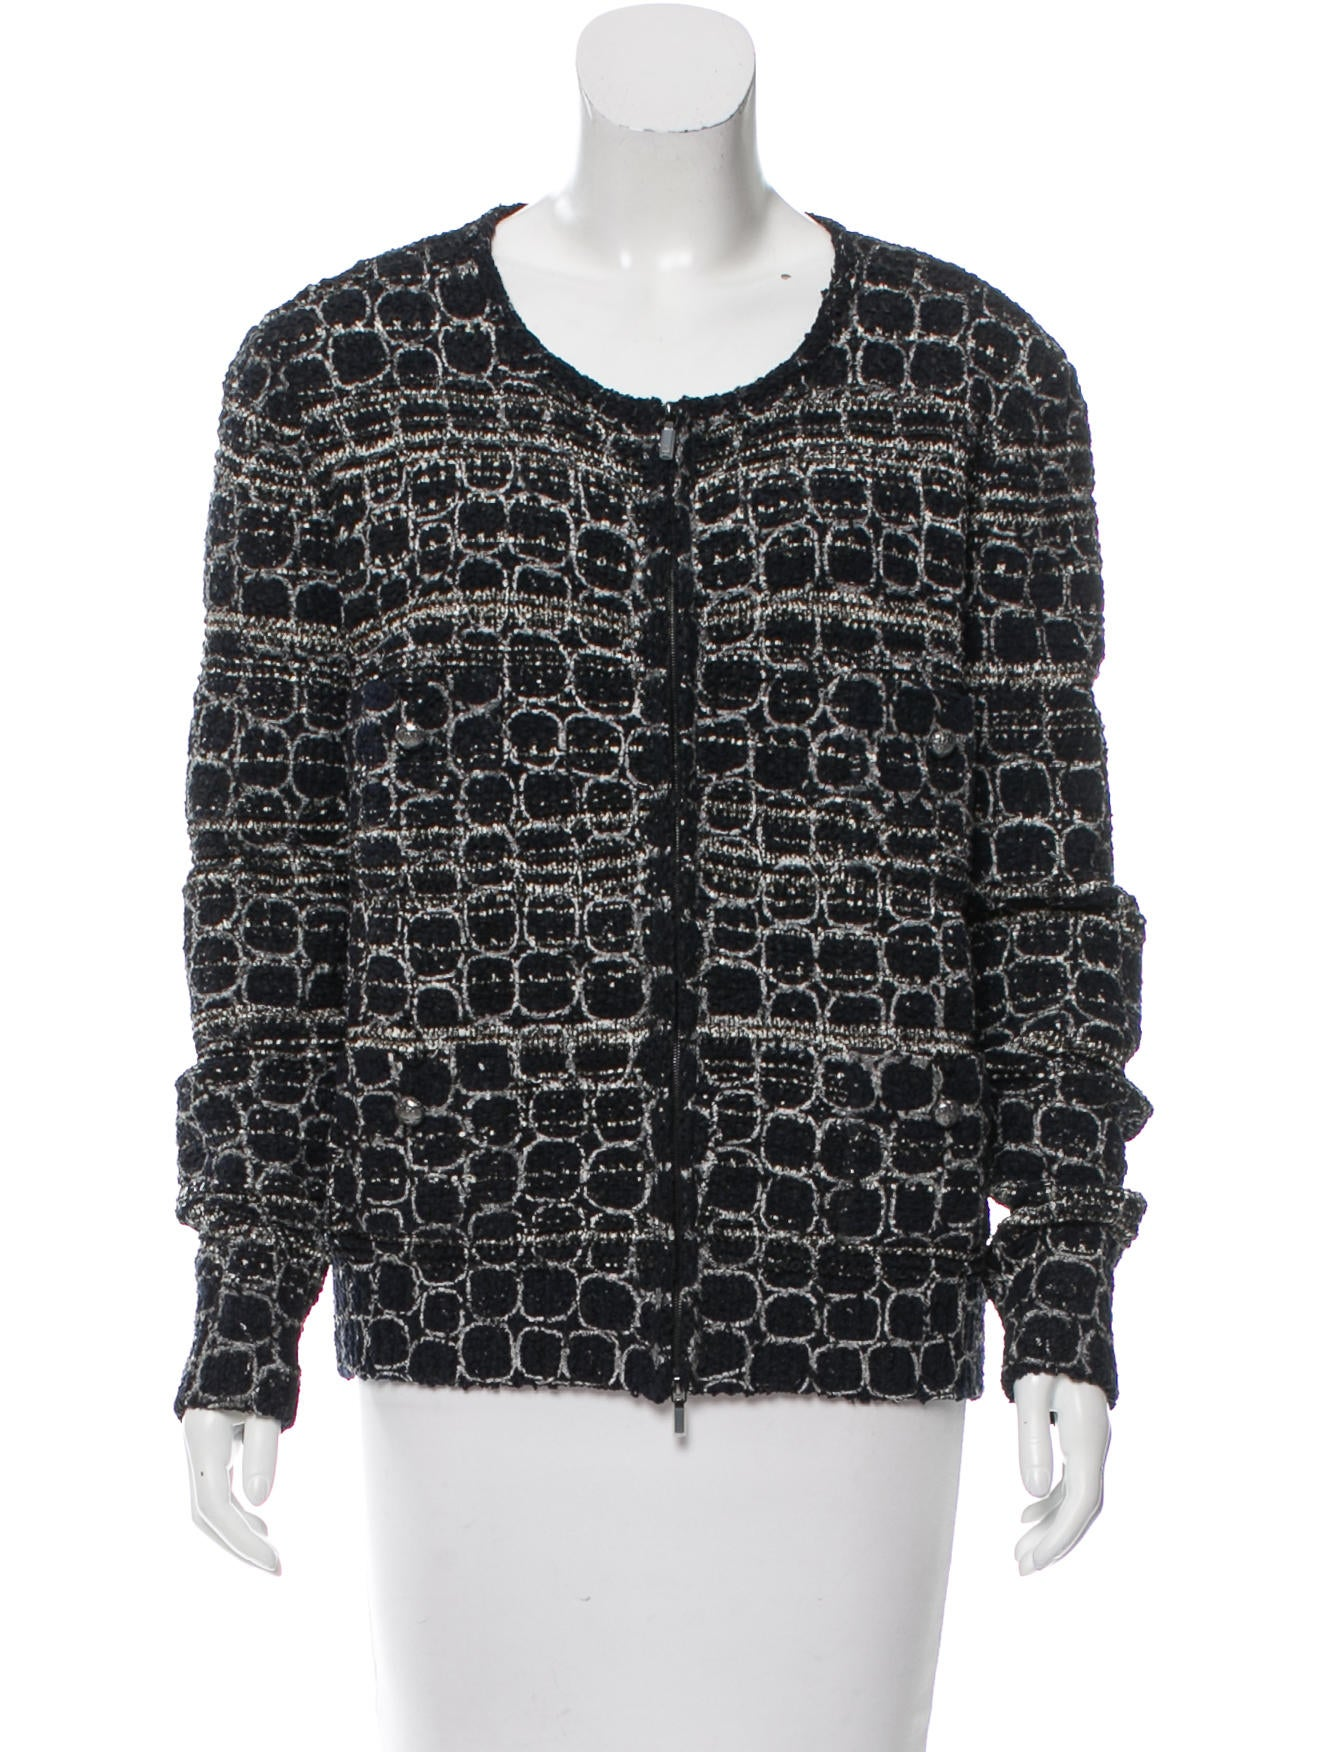 Chanel Knit Printed Jacket - Clothing - CHA162798 The RealReal